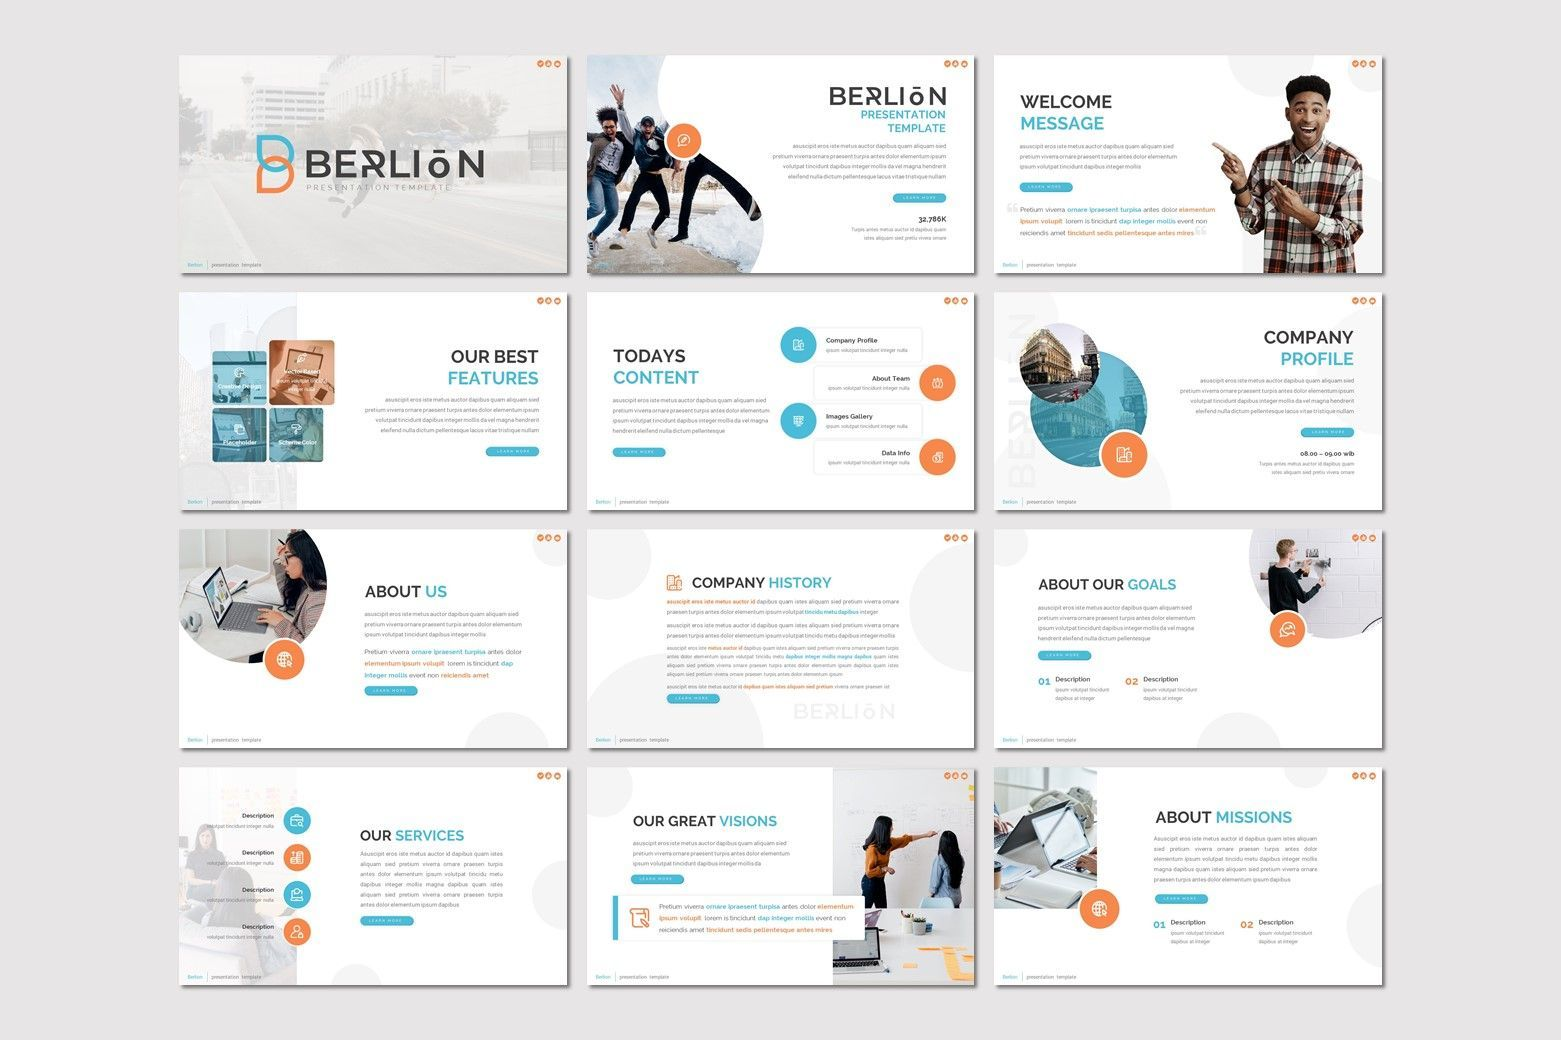 Berlion - Google Slides Template, Slide 2, 08041, Presentation Templates — PoweredTemplate.com